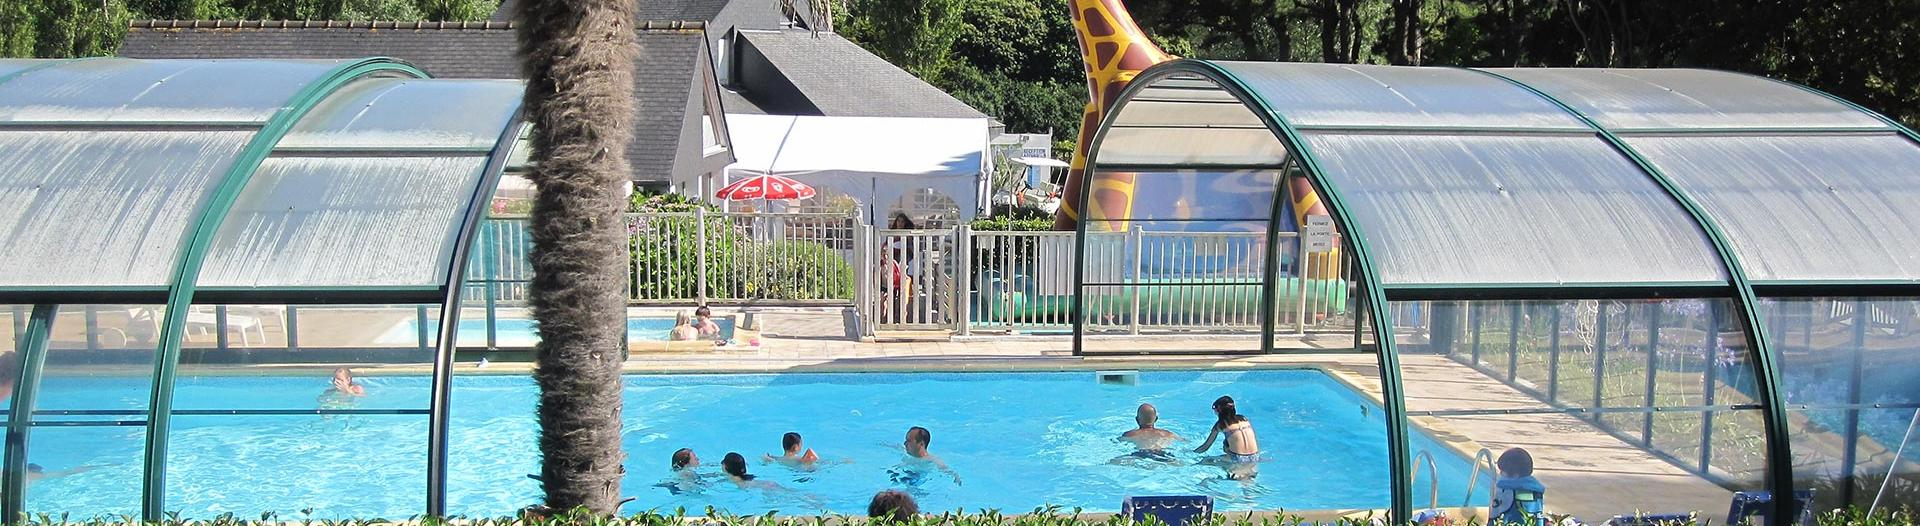 slider-camping-capucines-piscine-couverte